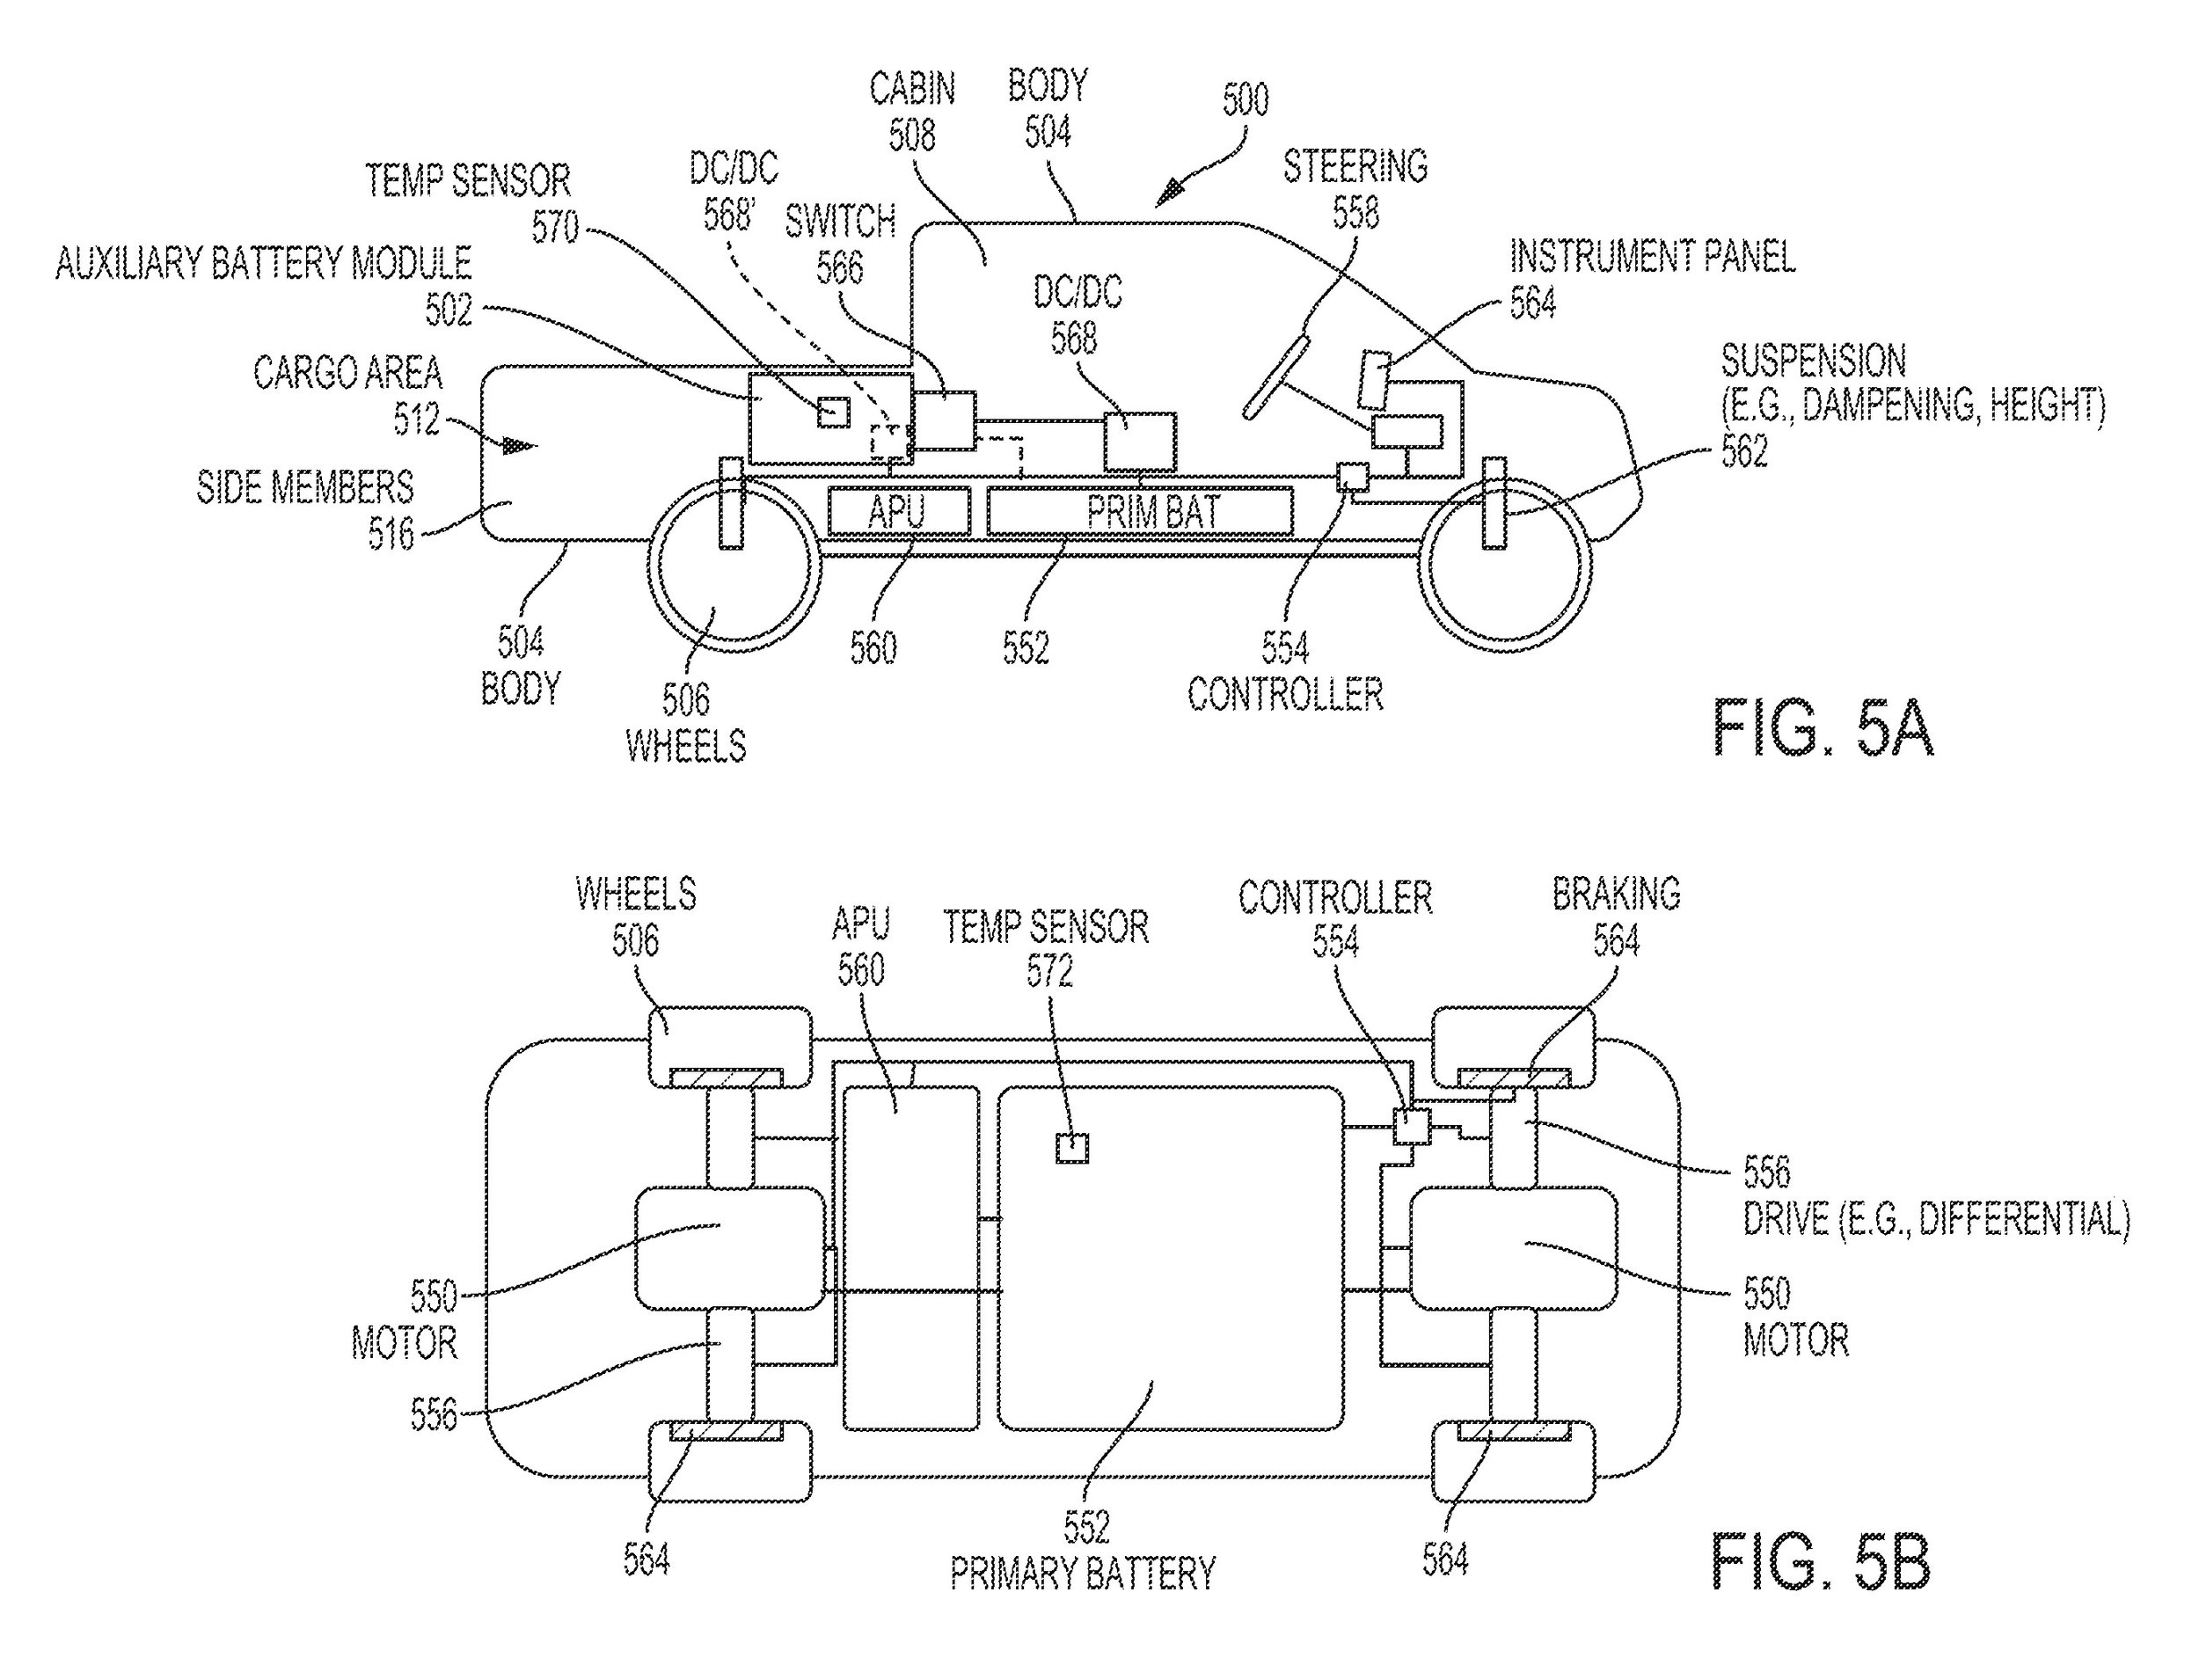 rivian-aux-battery-patent-1.jpg